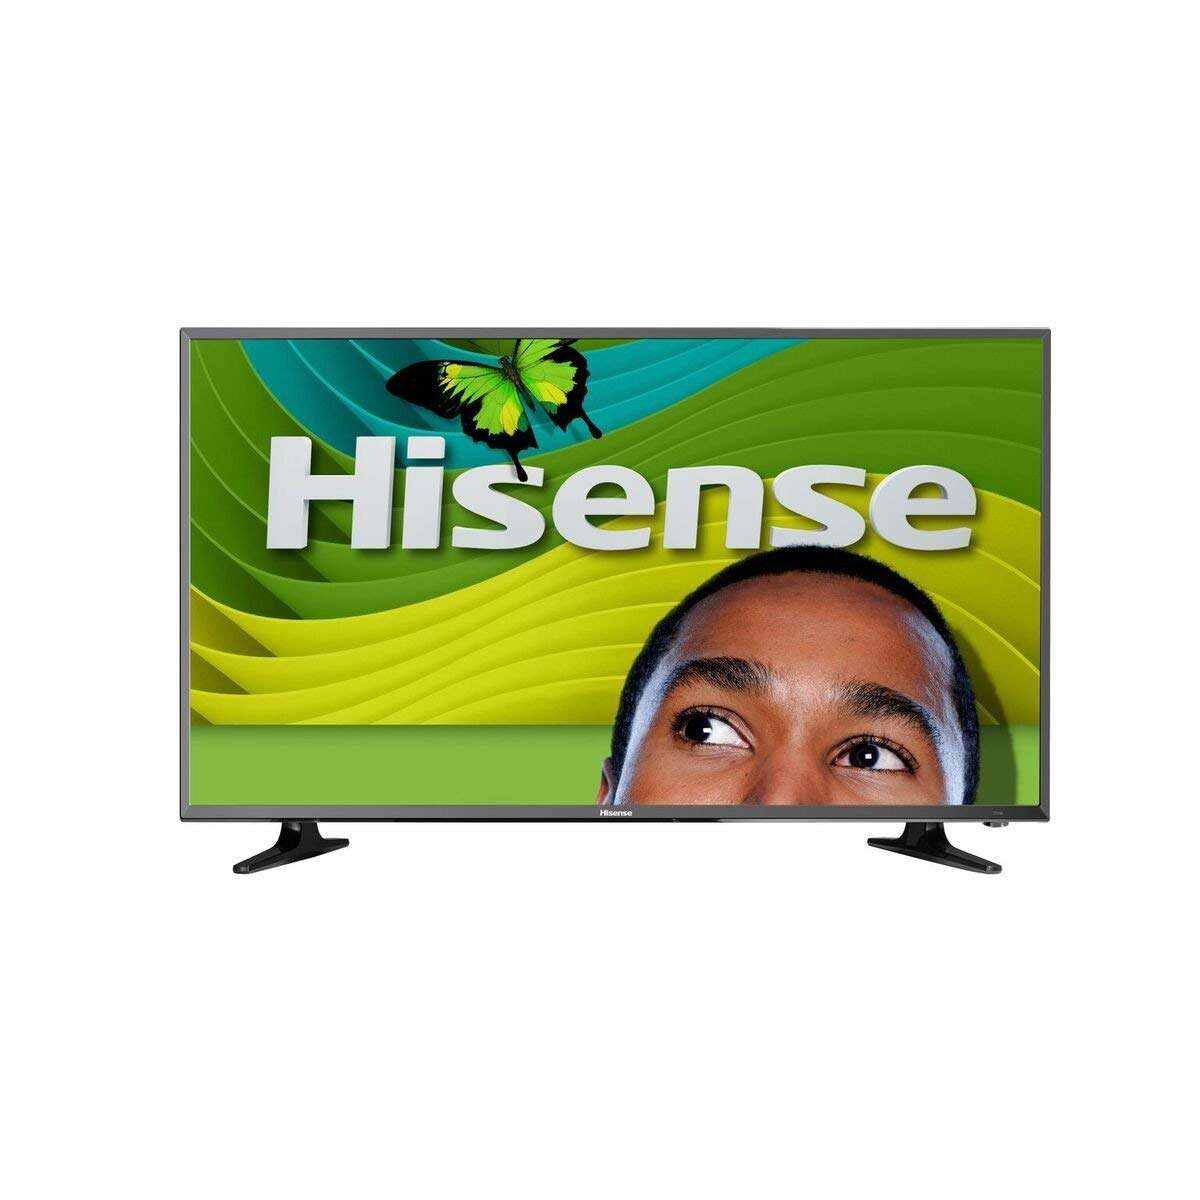 An image of Hisense 40H3E 40-Inch FHD LED TV